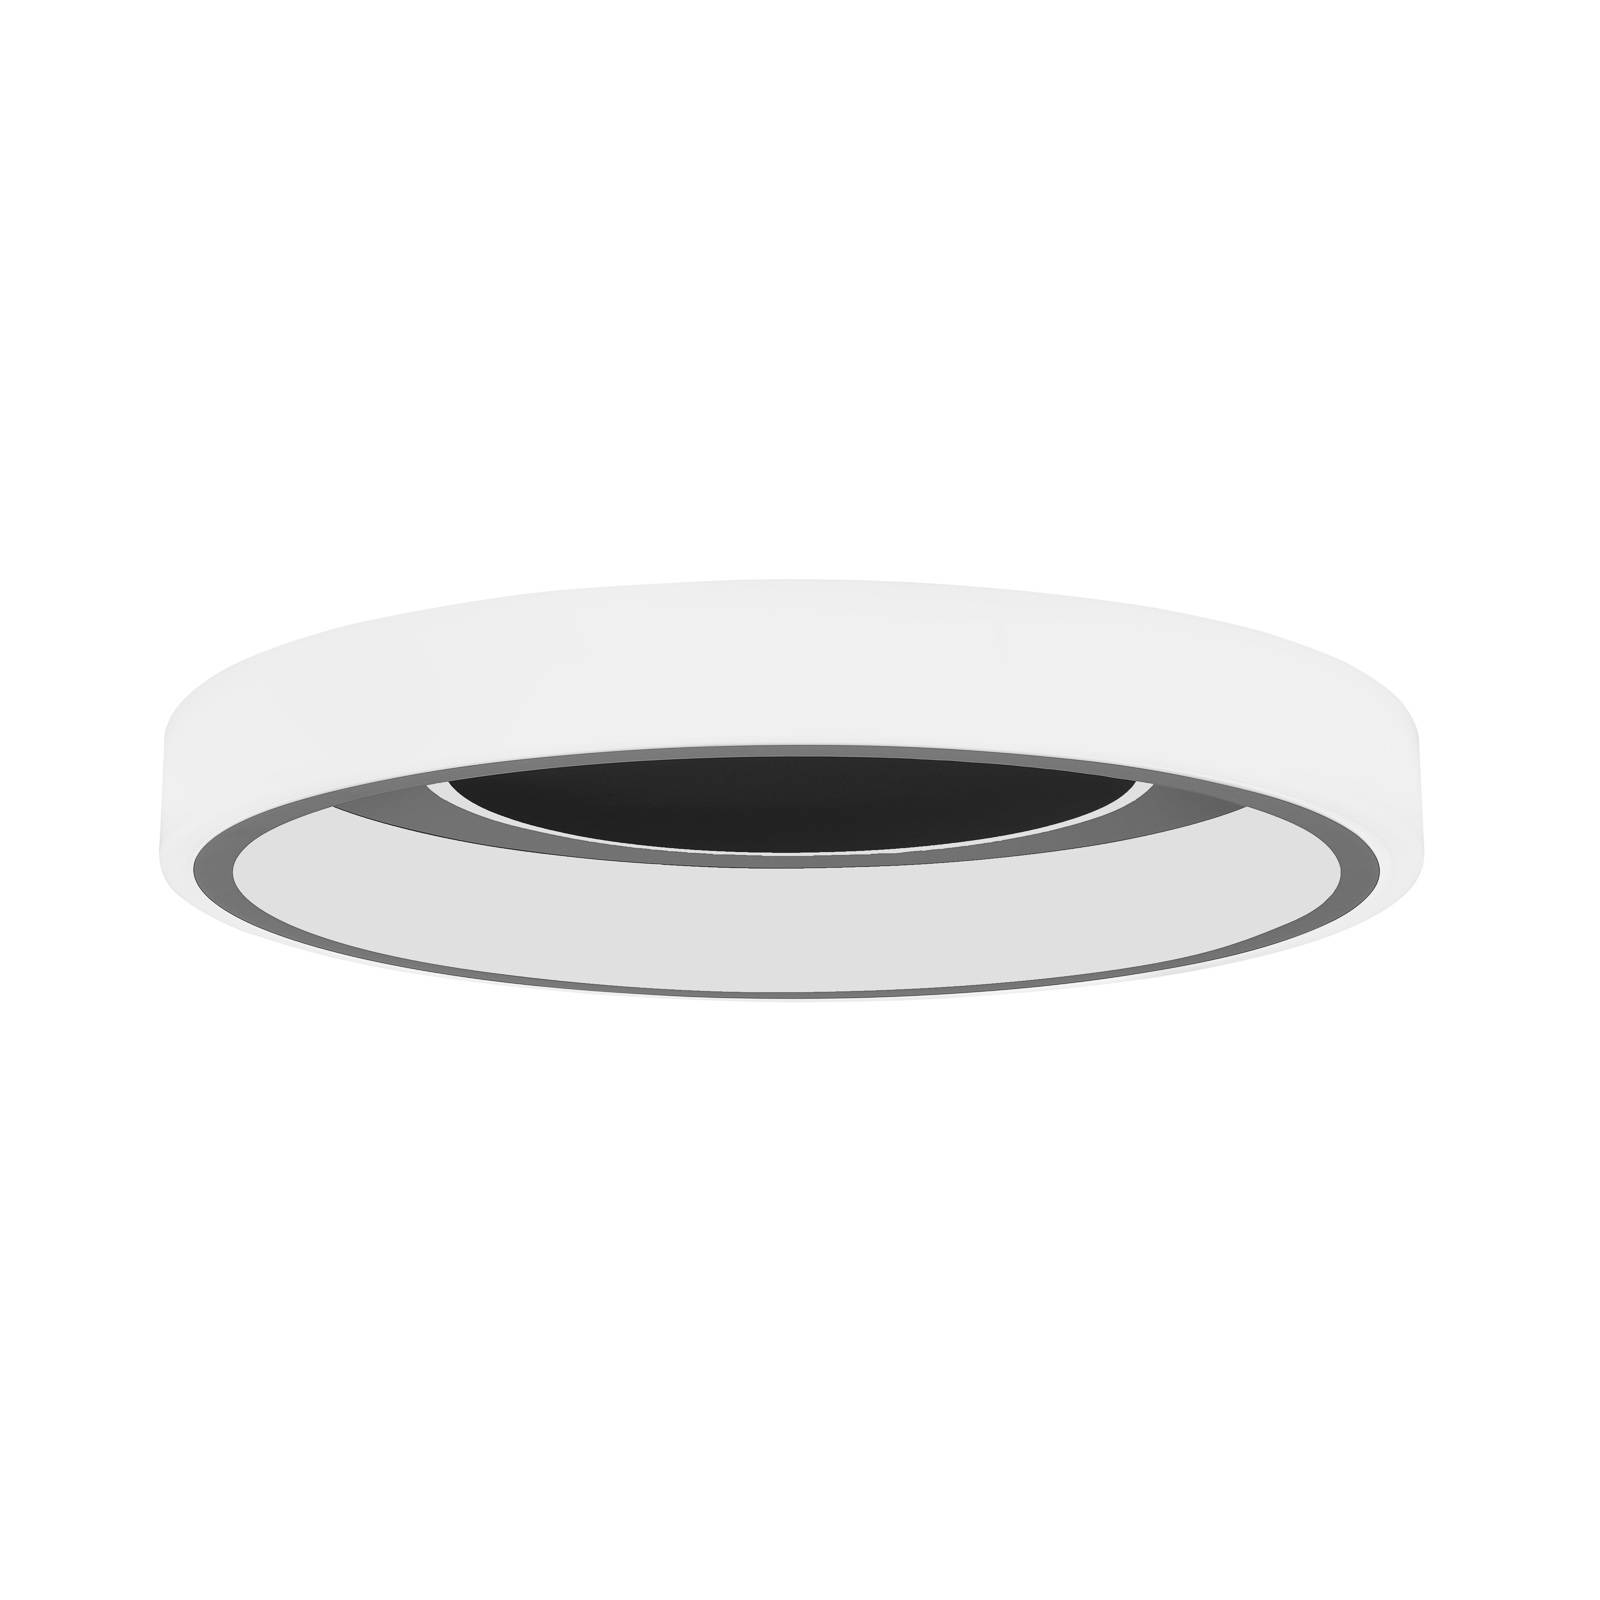 Lindby Wikani plafonnier LED, RVB, CCT, dimmable